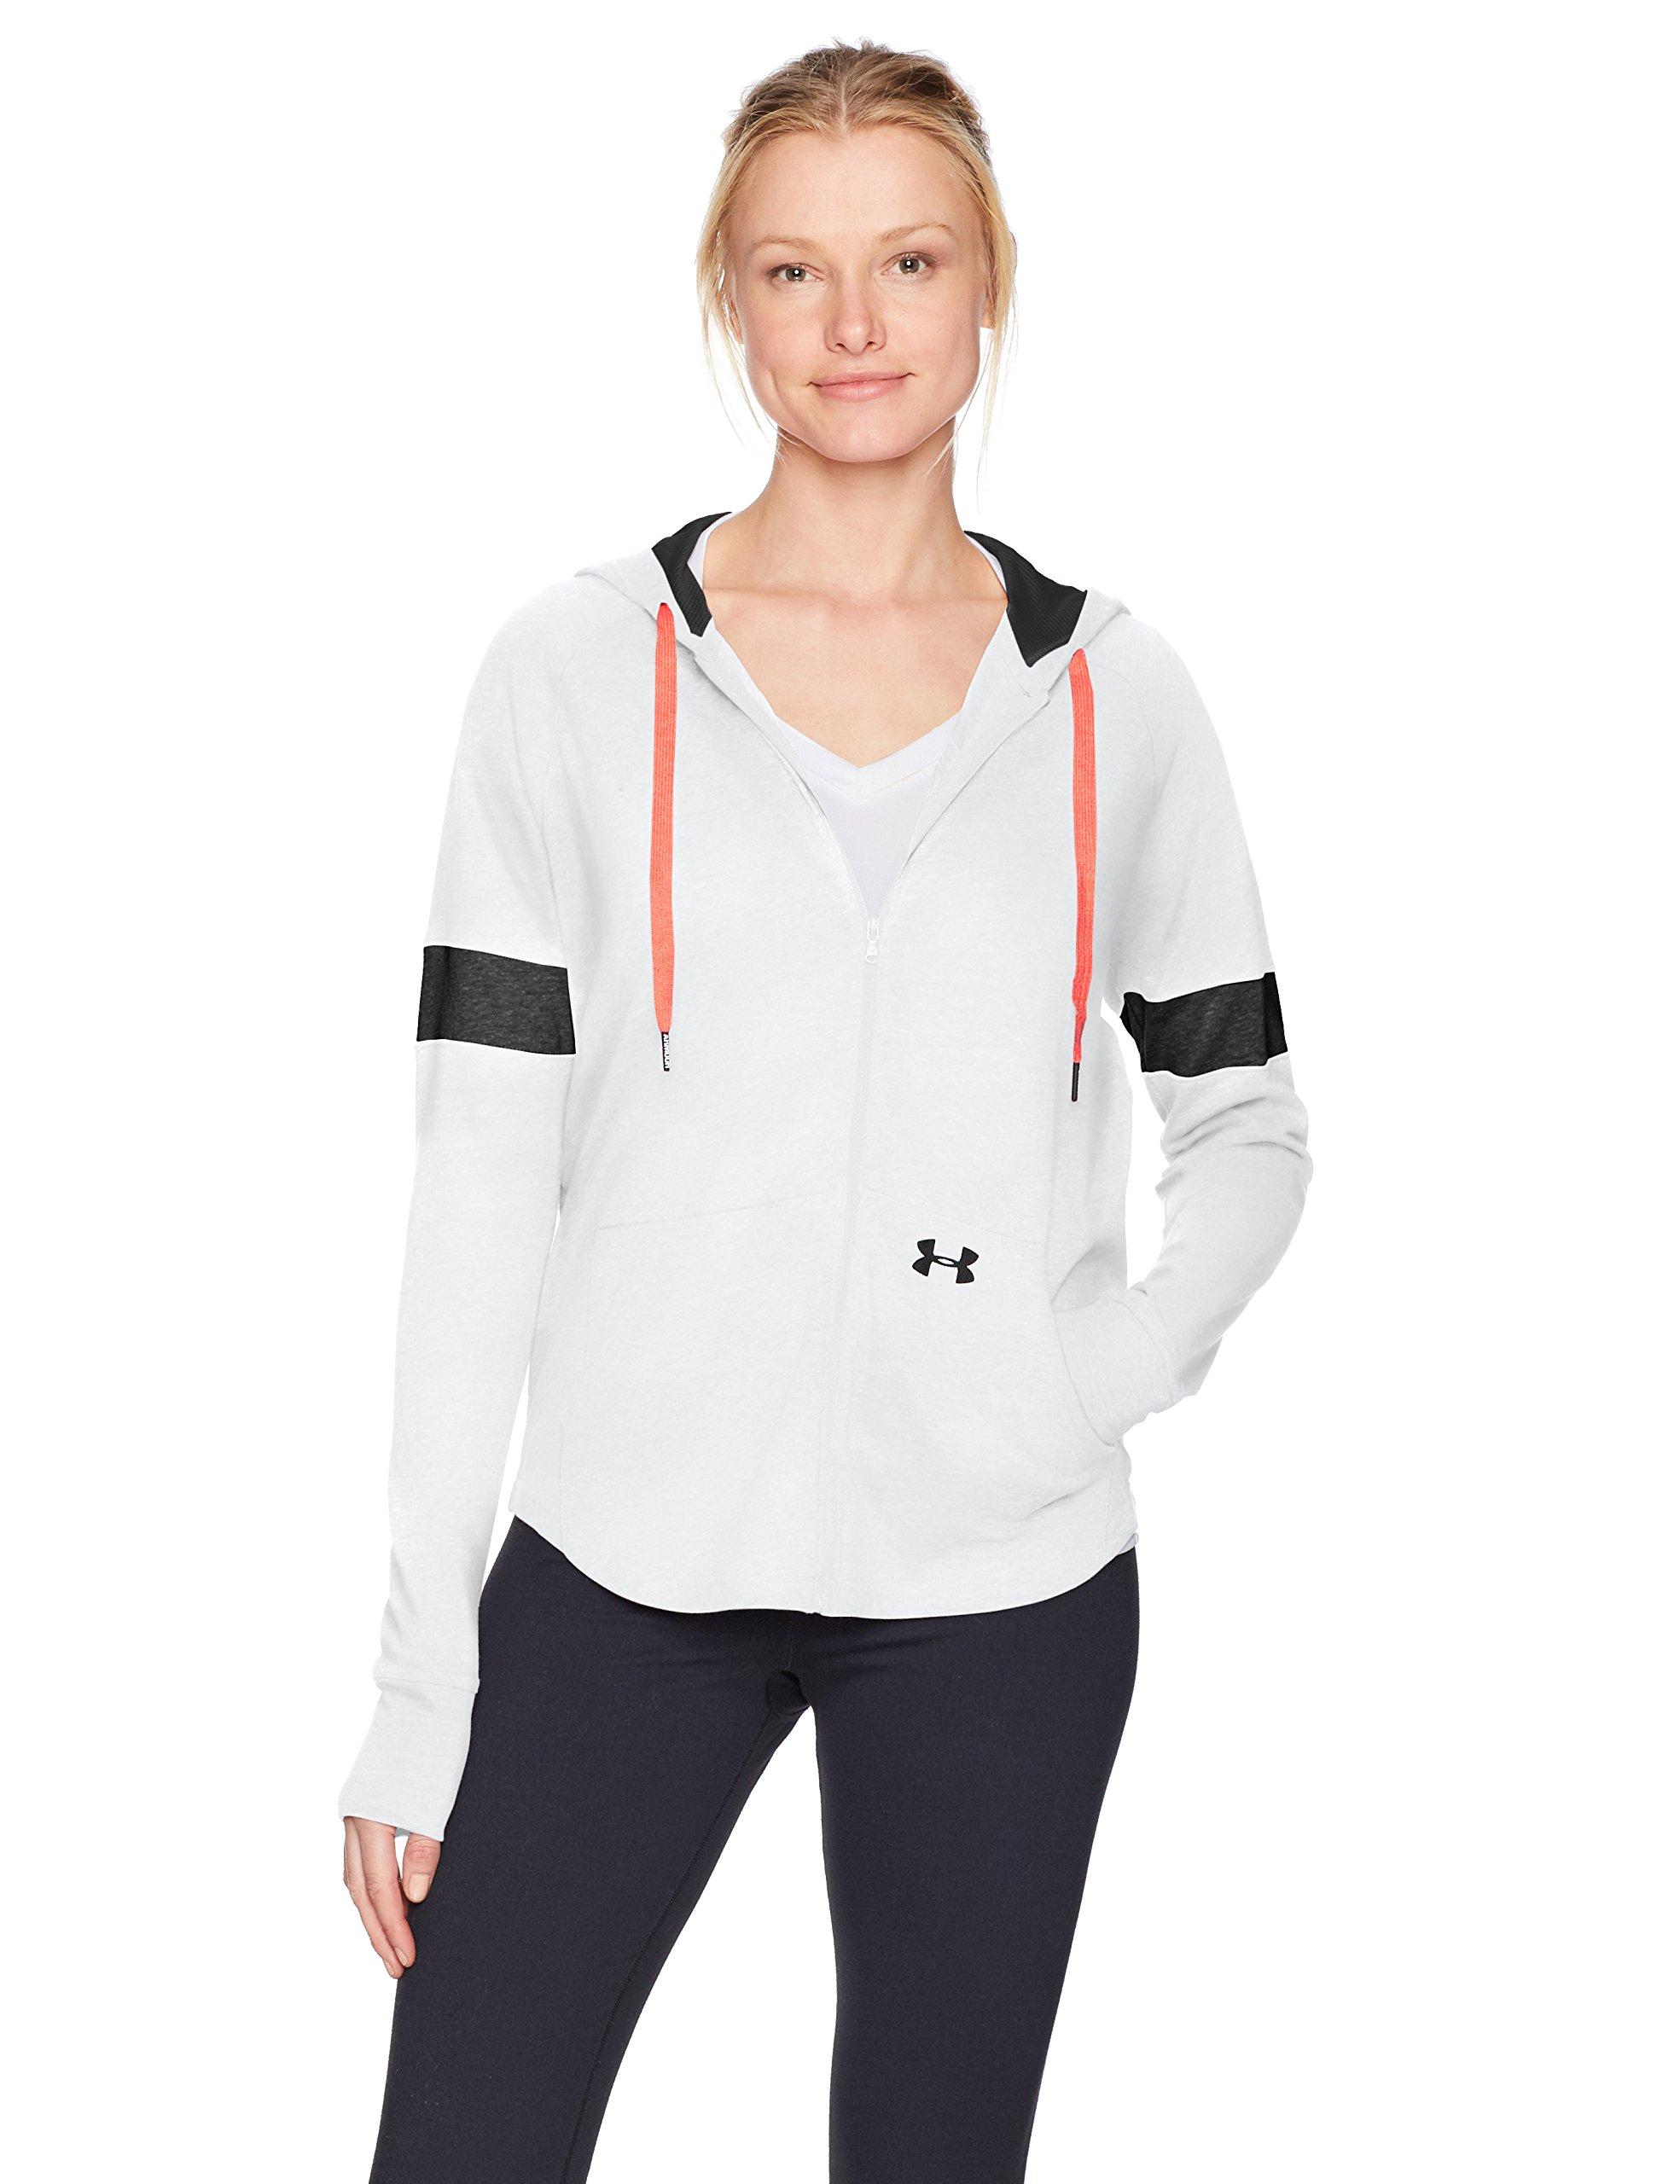 Under Armour Women's Sportstyle Full Zip Hoodie, White (100)/Black, Medium by Under Armour